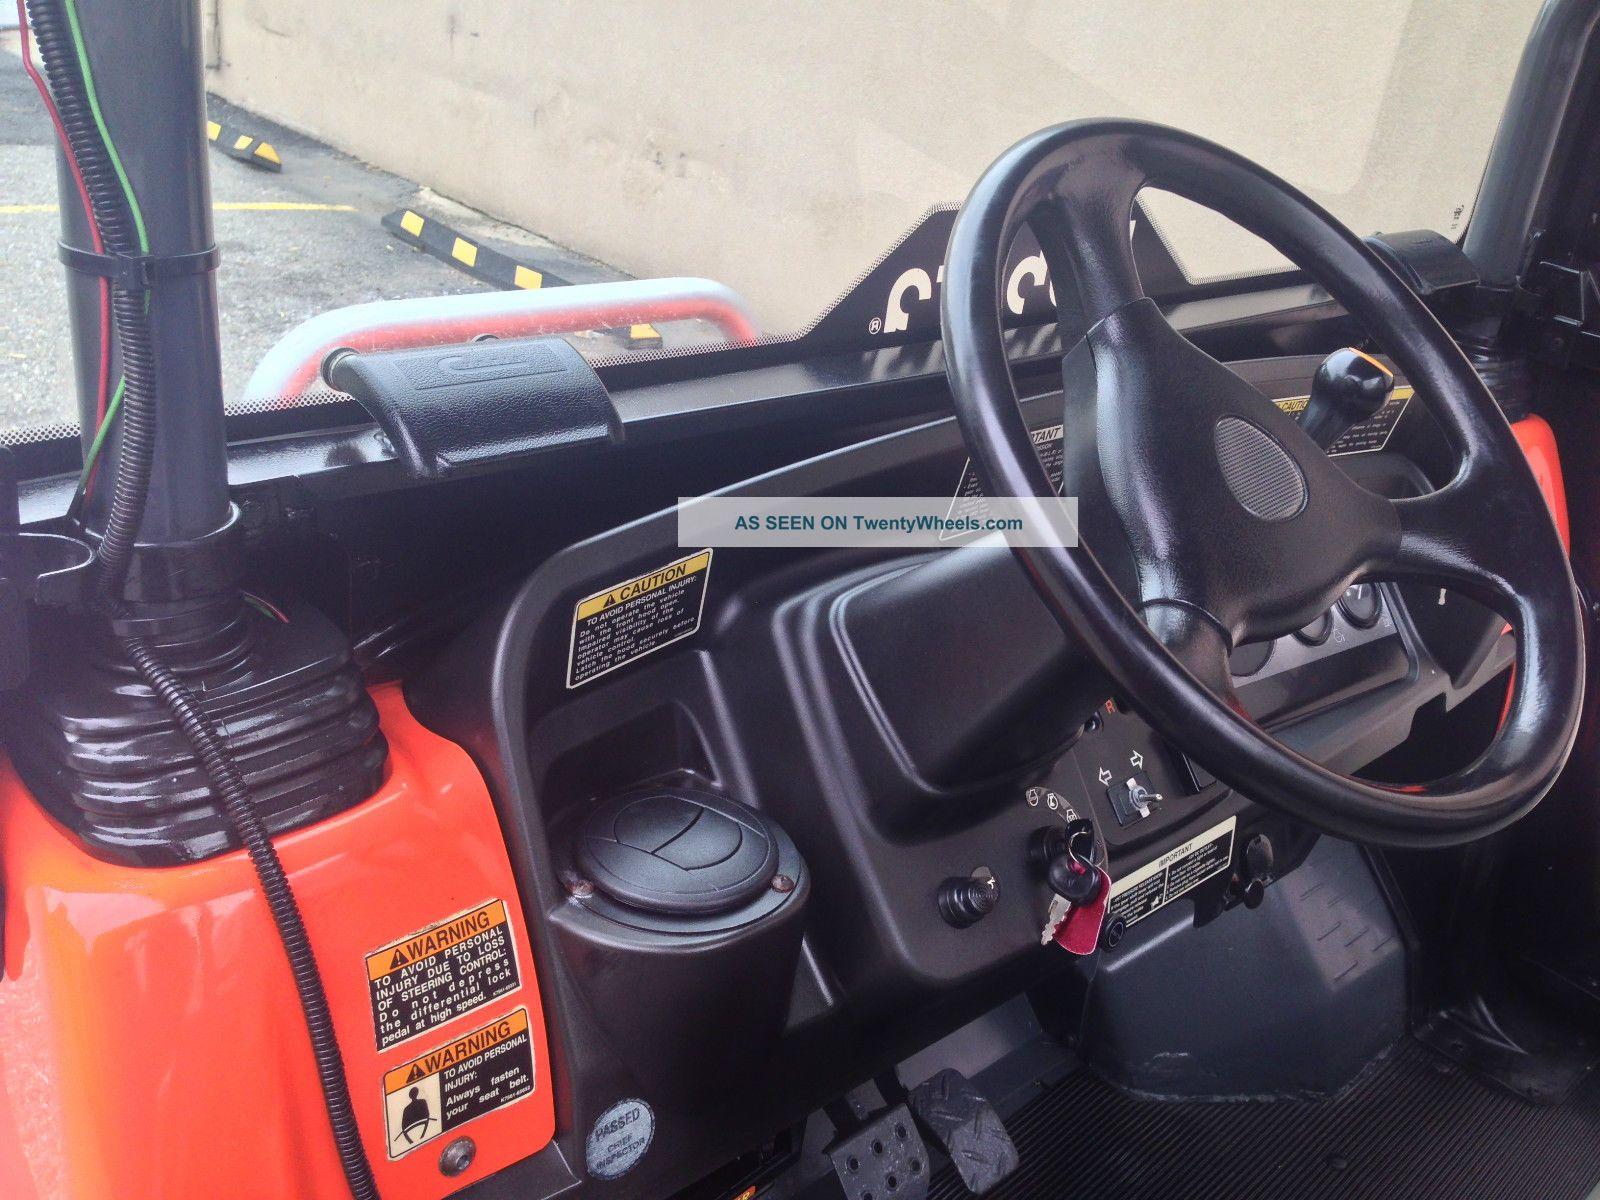 Kubota Rtv900 4x4 Diesel, Full Cab, Heater, Hydrostatic